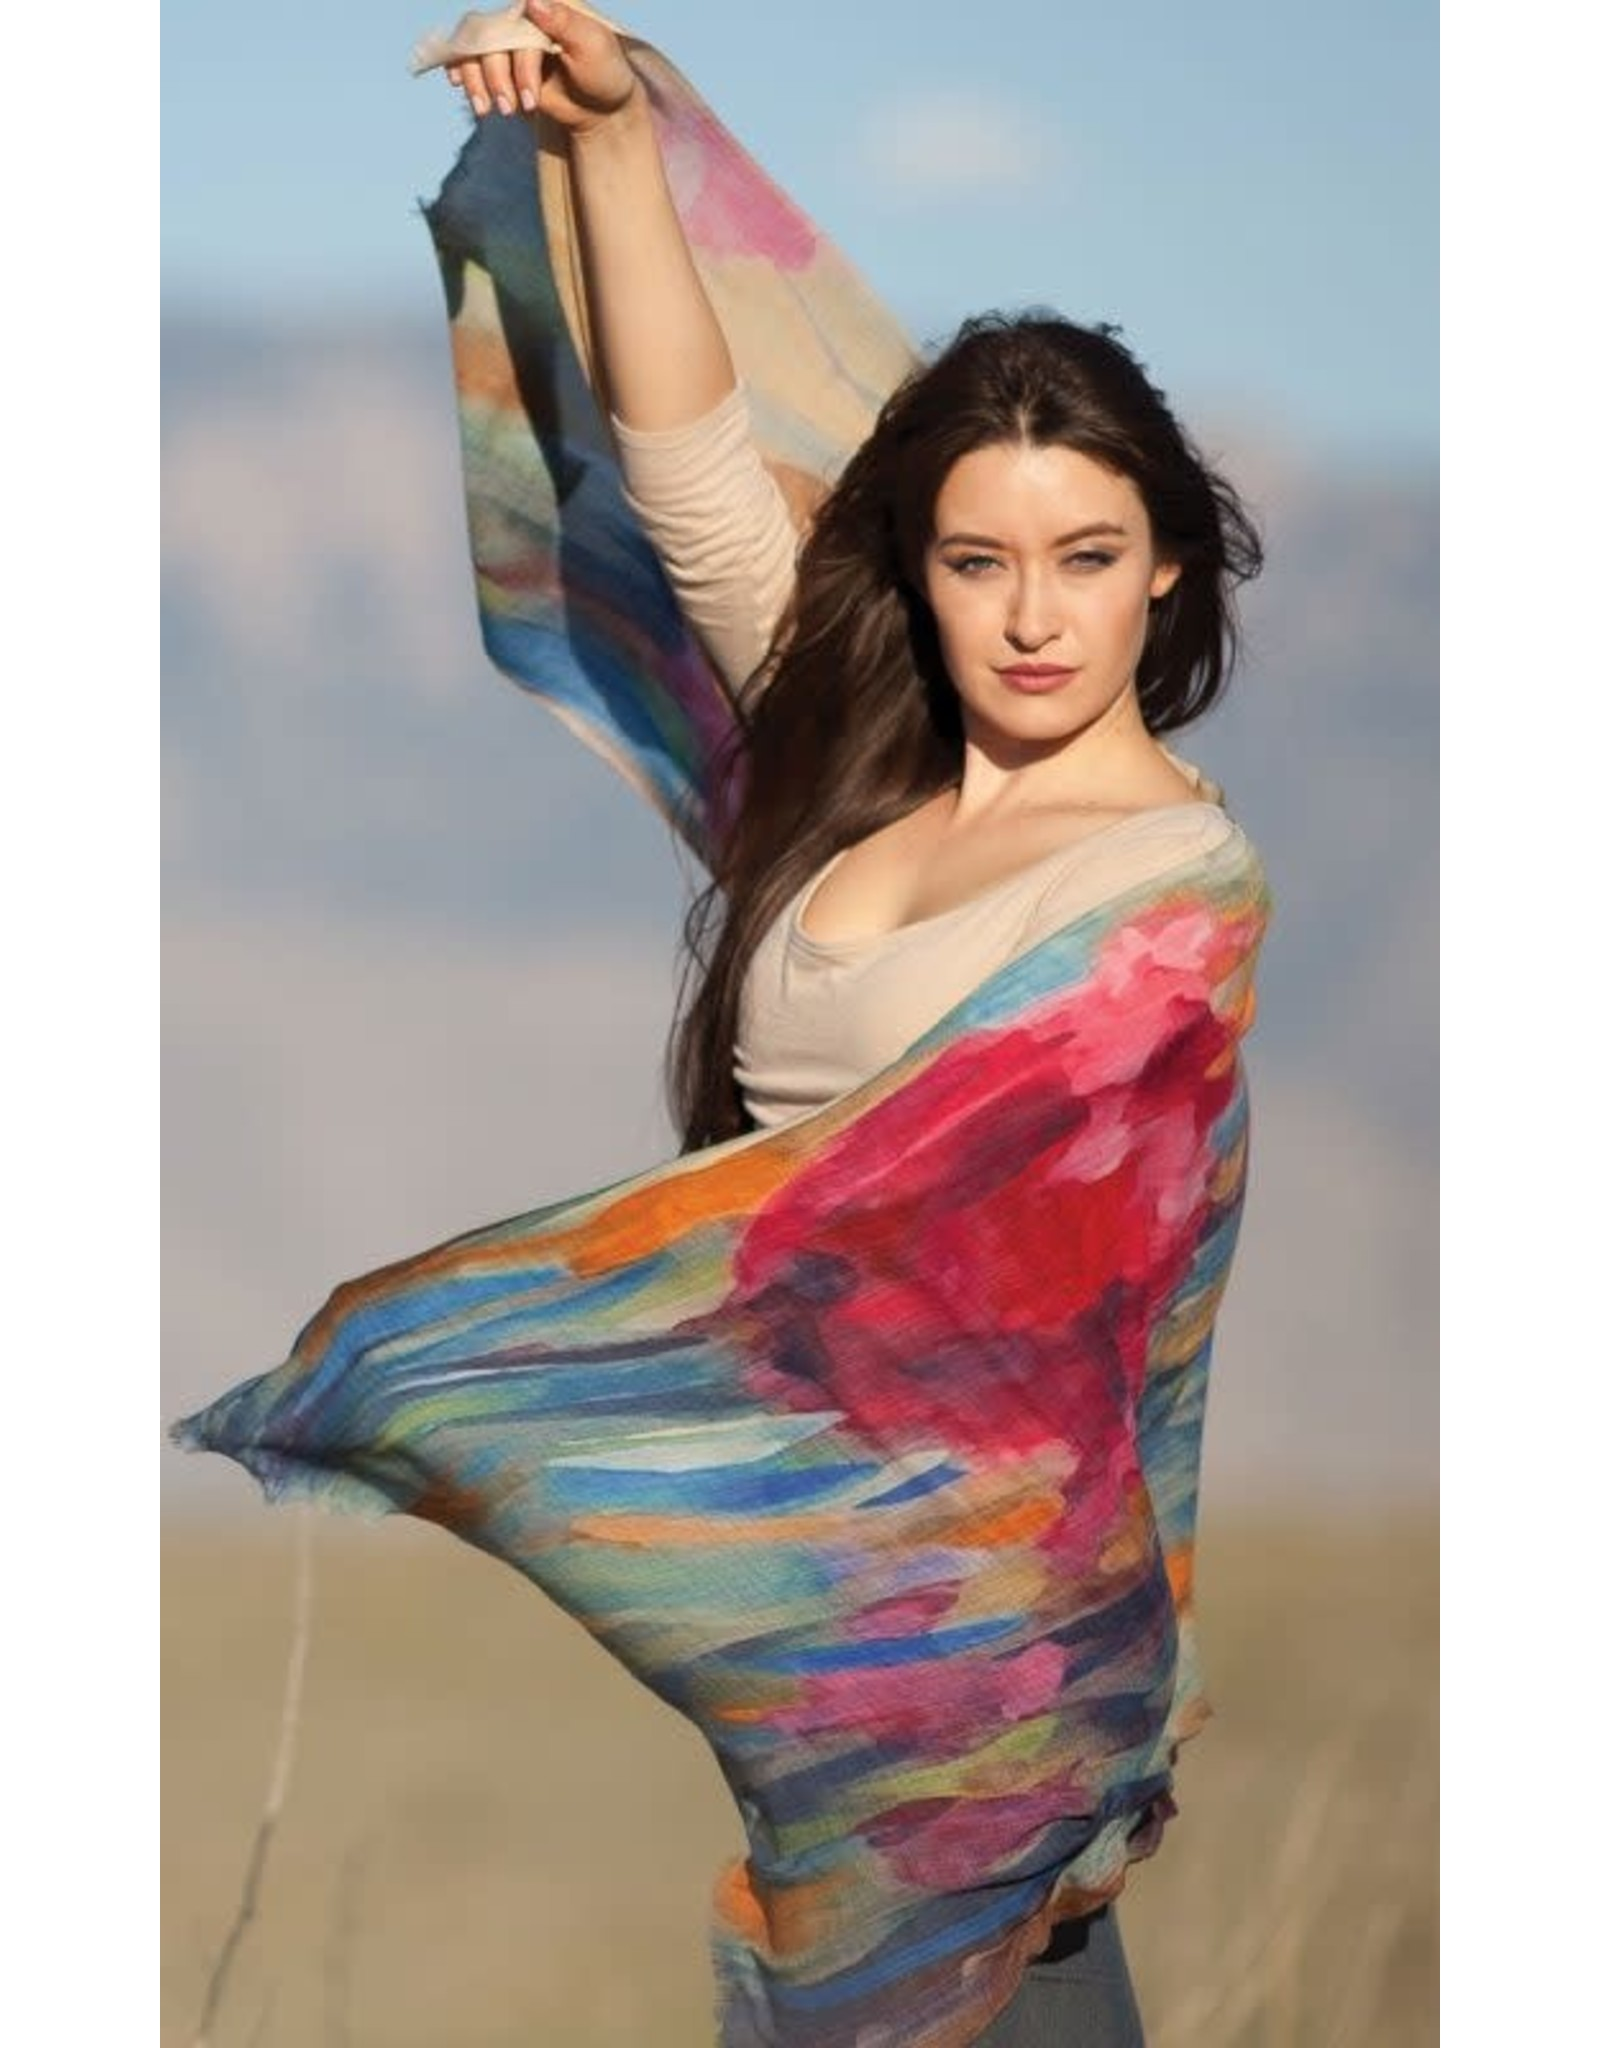 Reena Wool Shawl Bright Colors/Floral,  India